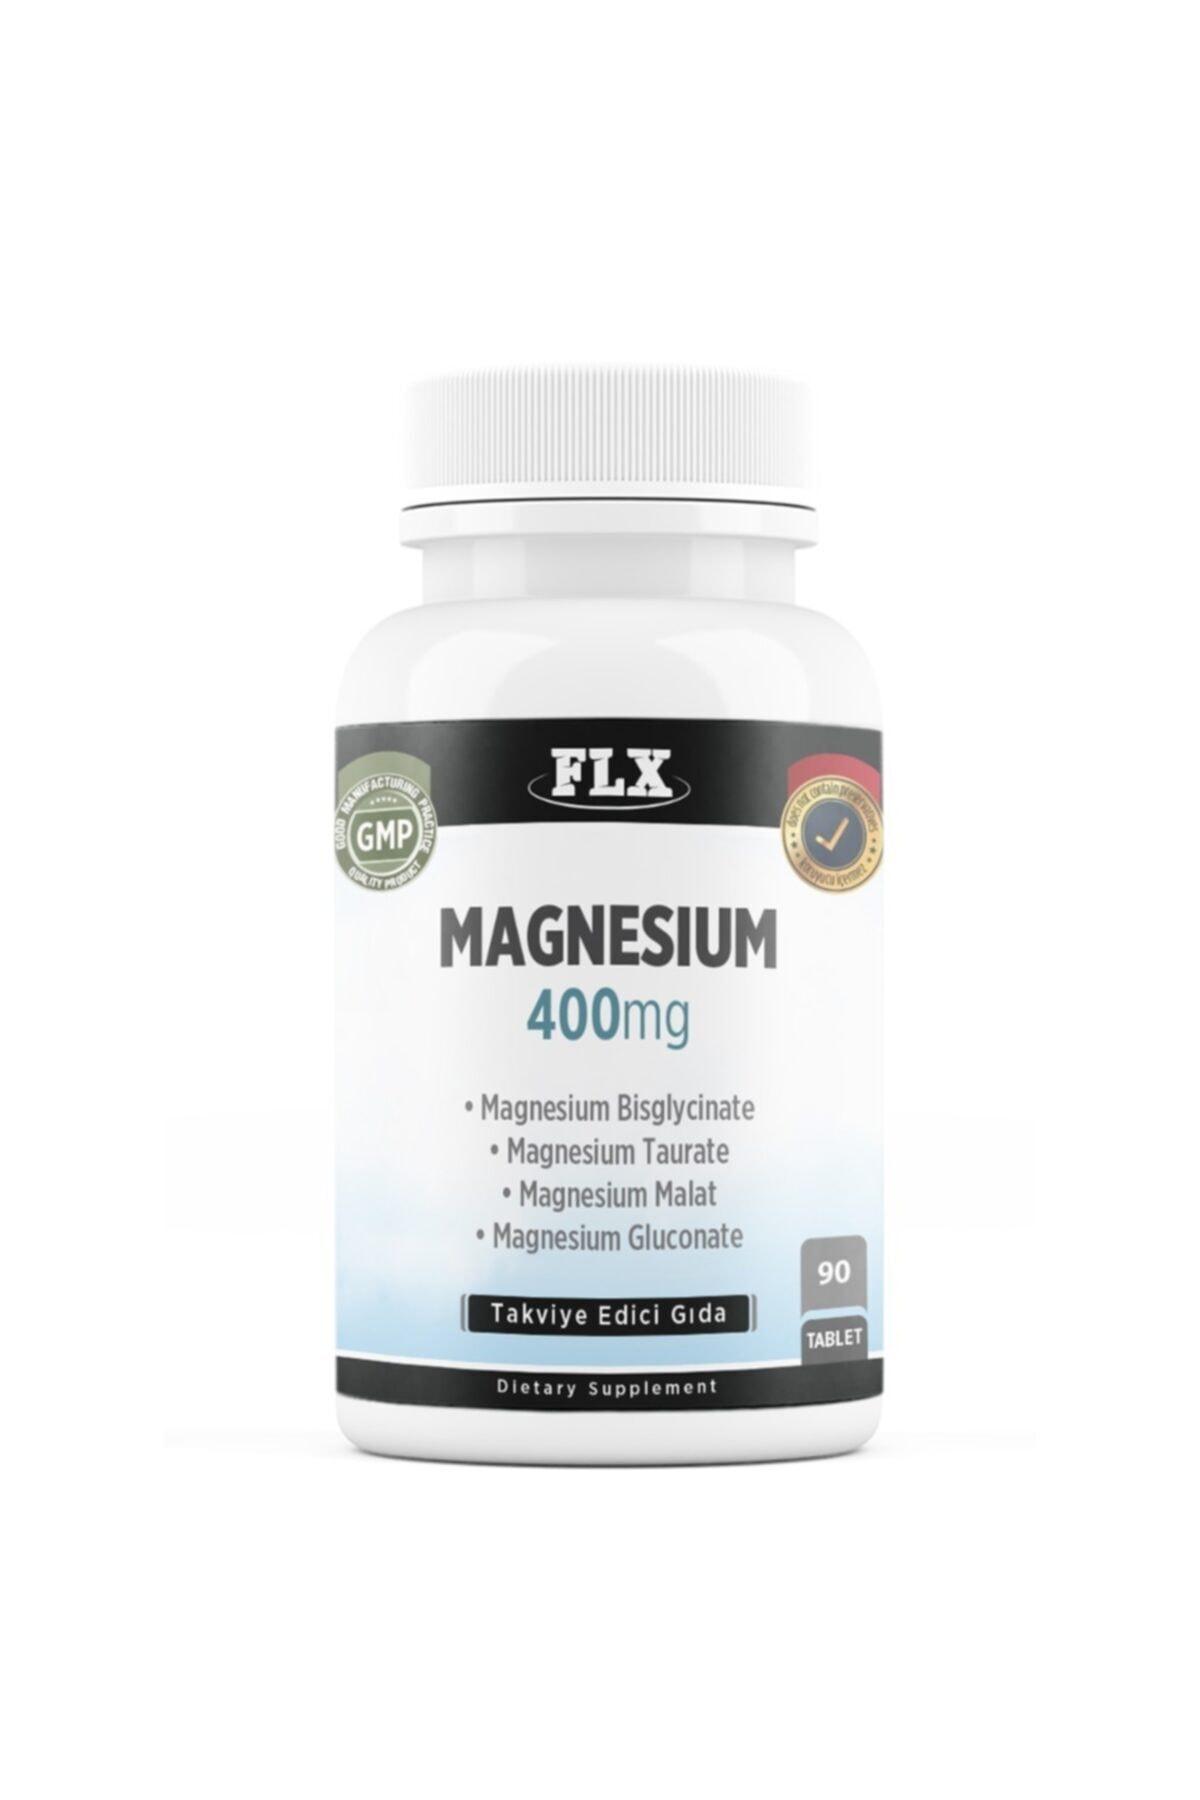 FLX Elemental Magnezyum Magnesium Bisglisinat Malat Taurat Glukonat 90 Tablet 1